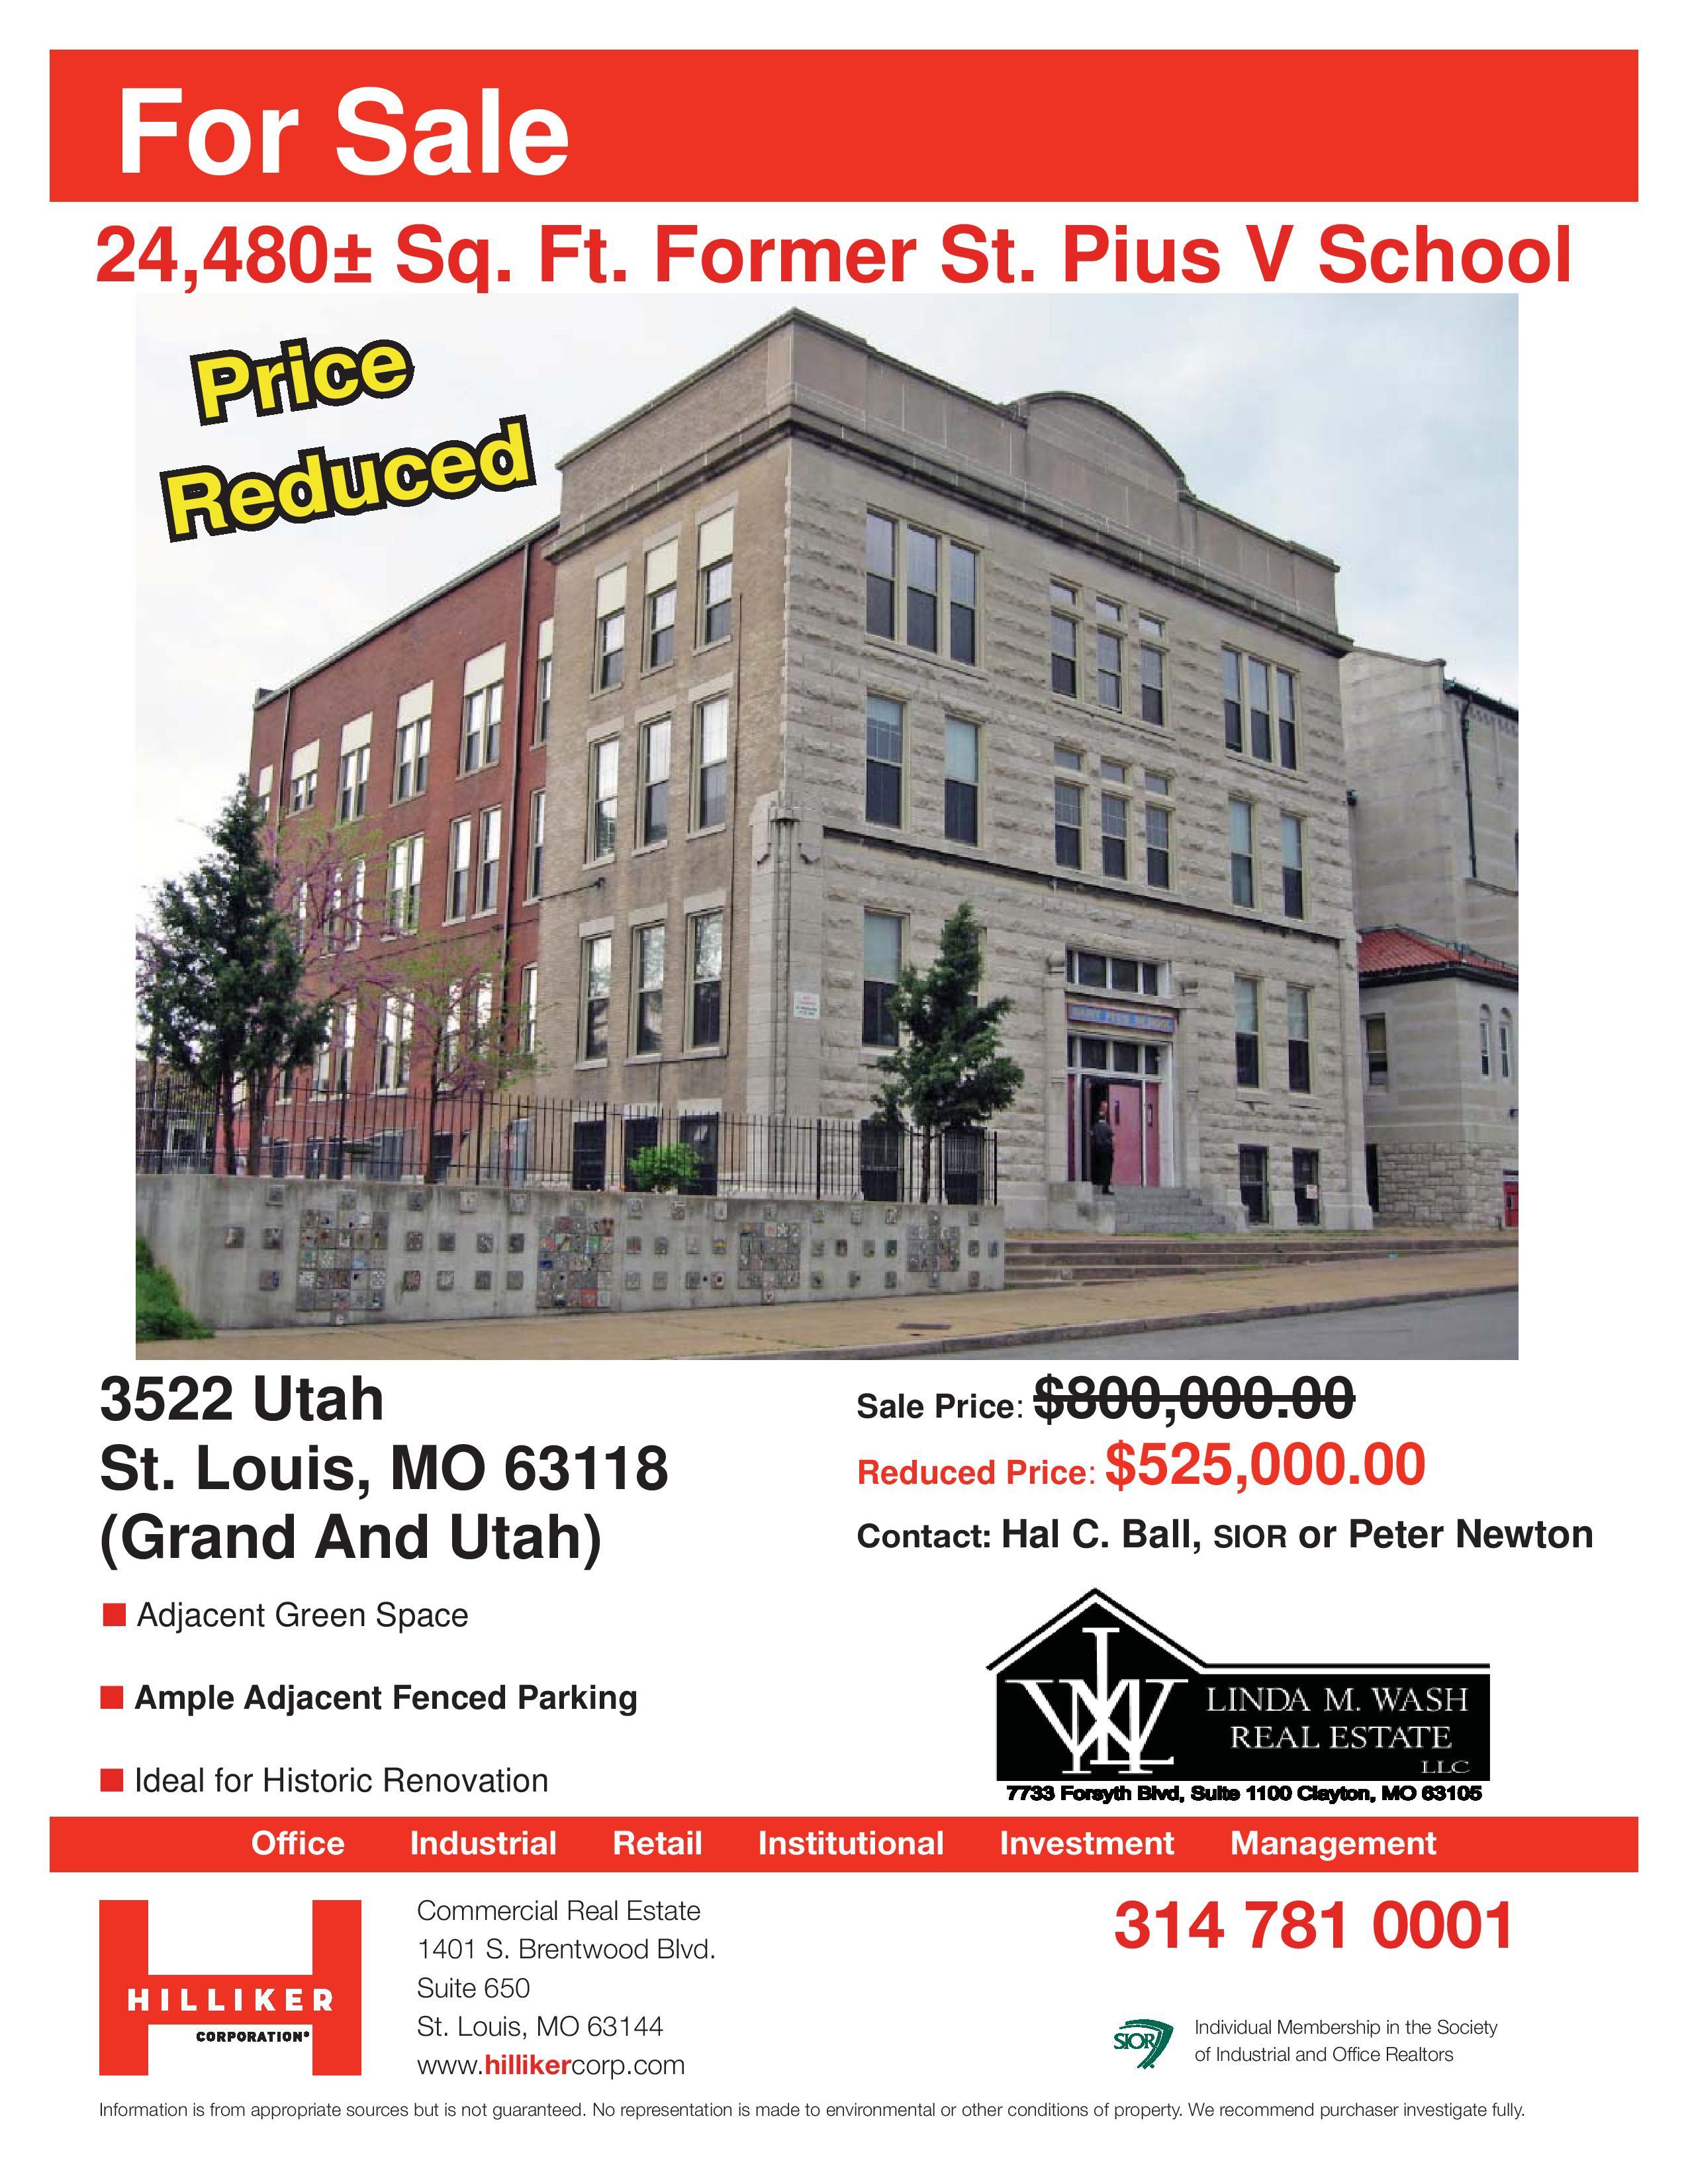 3522-utah-st-pius-v-school